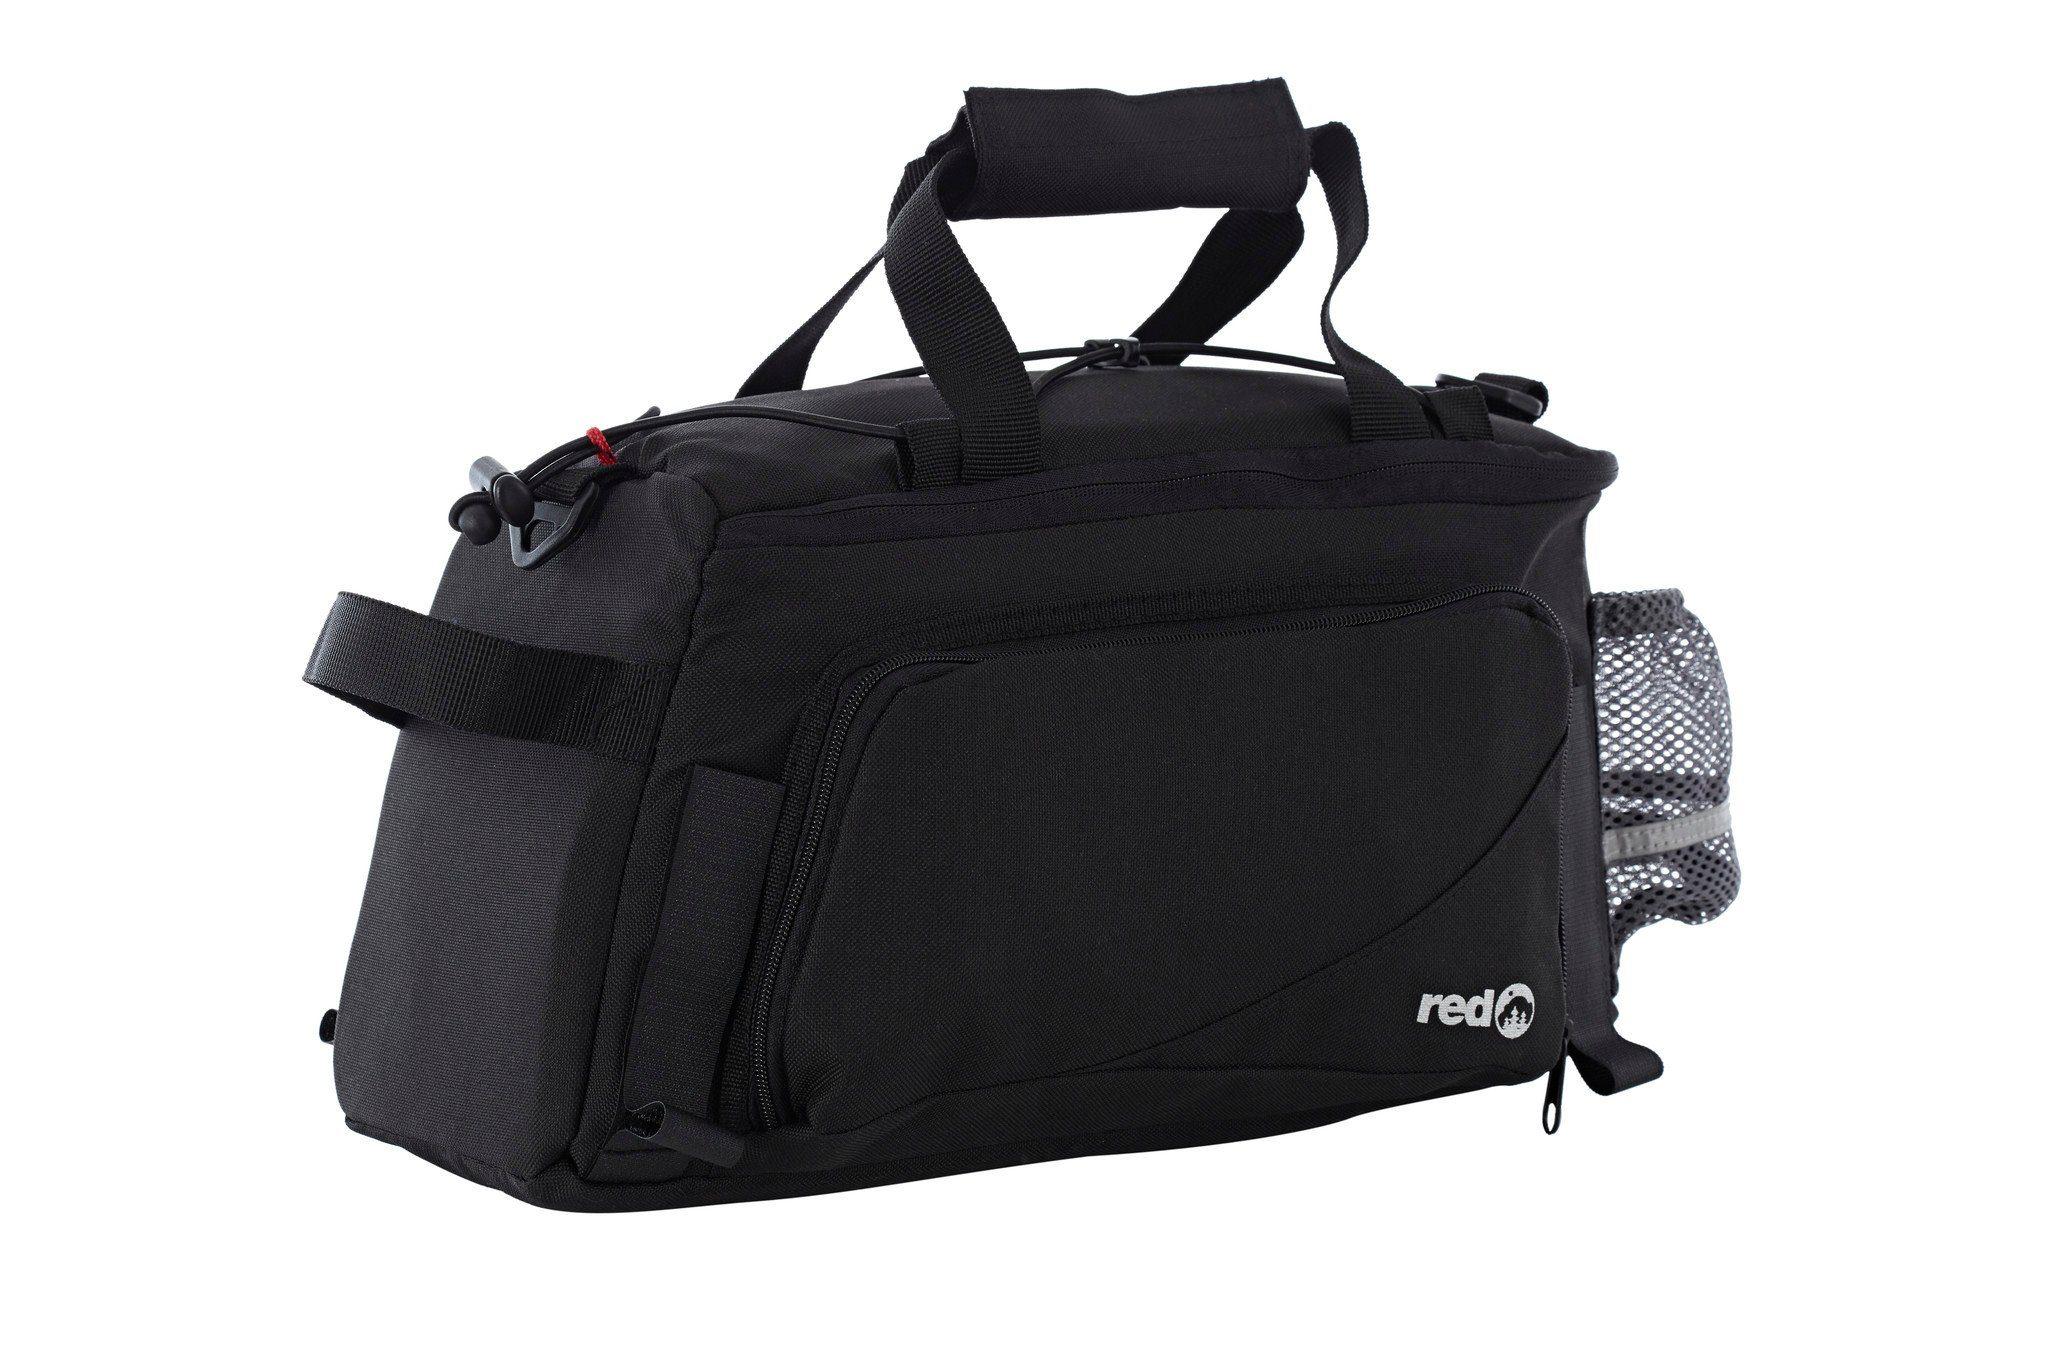 Red Cycling Products Gepäckträgertasche »Back Loader Gepäckträgertasche«